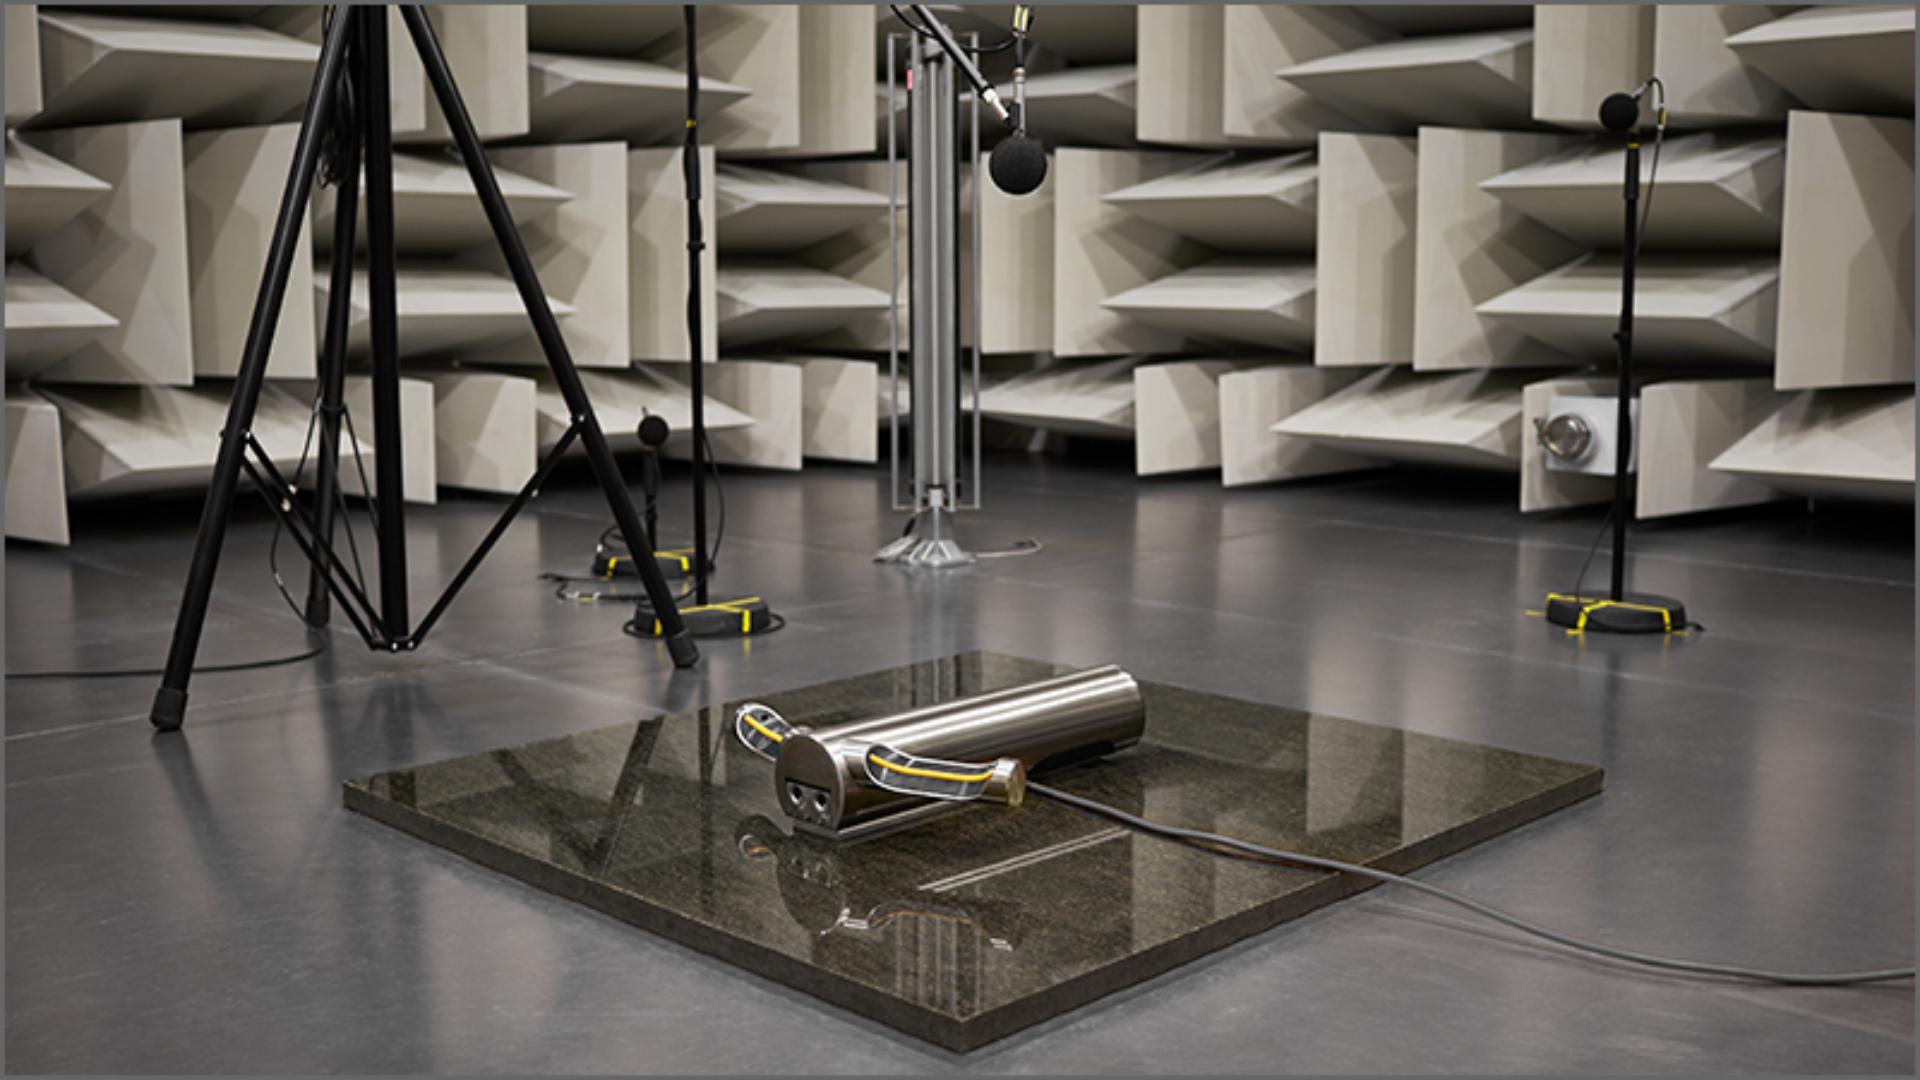 Image of sound engineering room